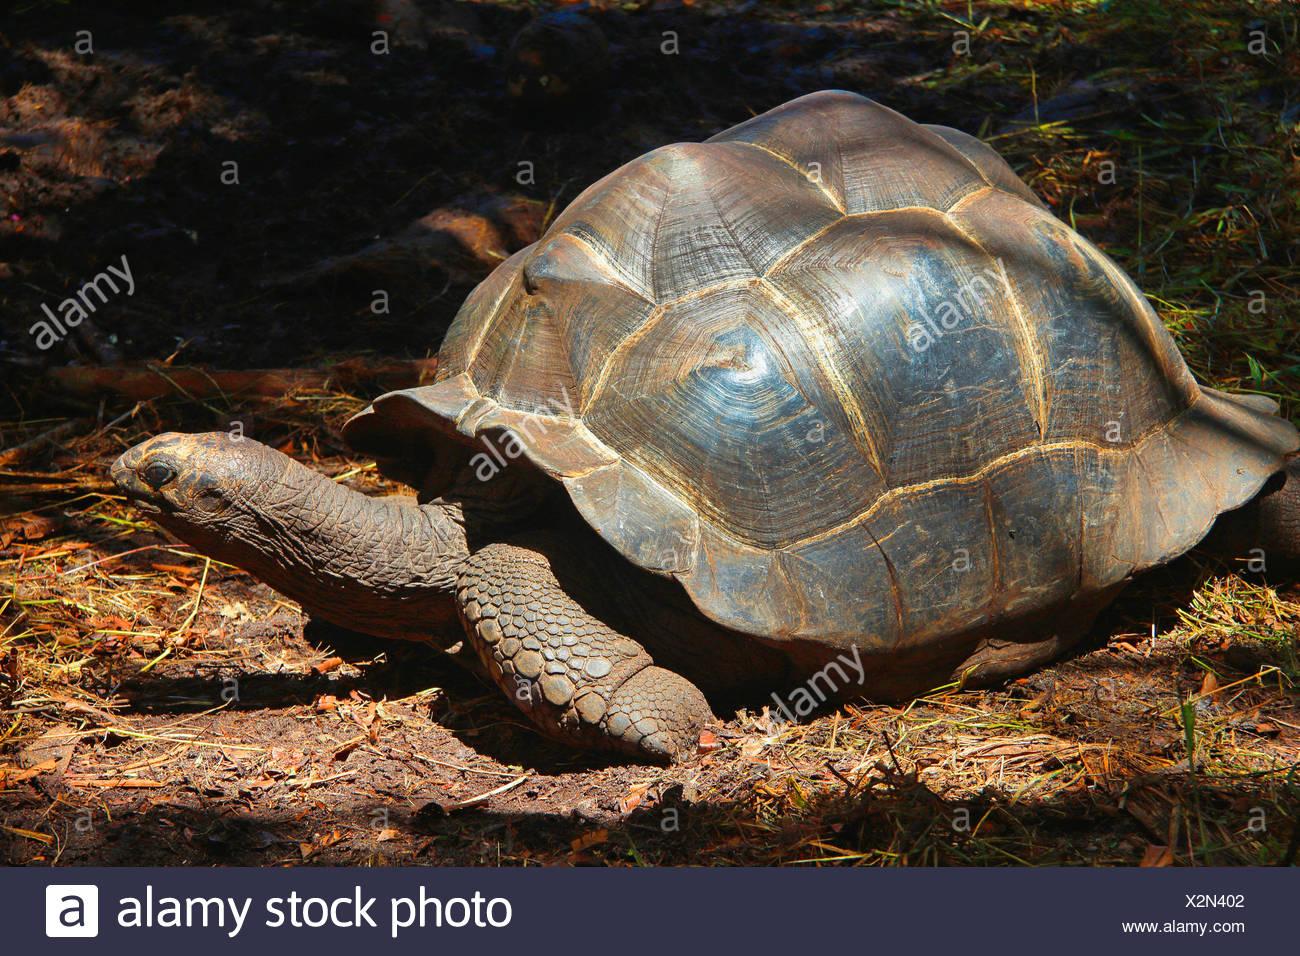 Seychelles giant tortoise, Aldabran giant tortoise, Aldabra giant tortoise (Aldabrachelys gigantea, Testudo gigantea, Geochelone gigantea, Megalochelys gigantea), single animal in a glade, Seychelles, La Digue - Stock Image